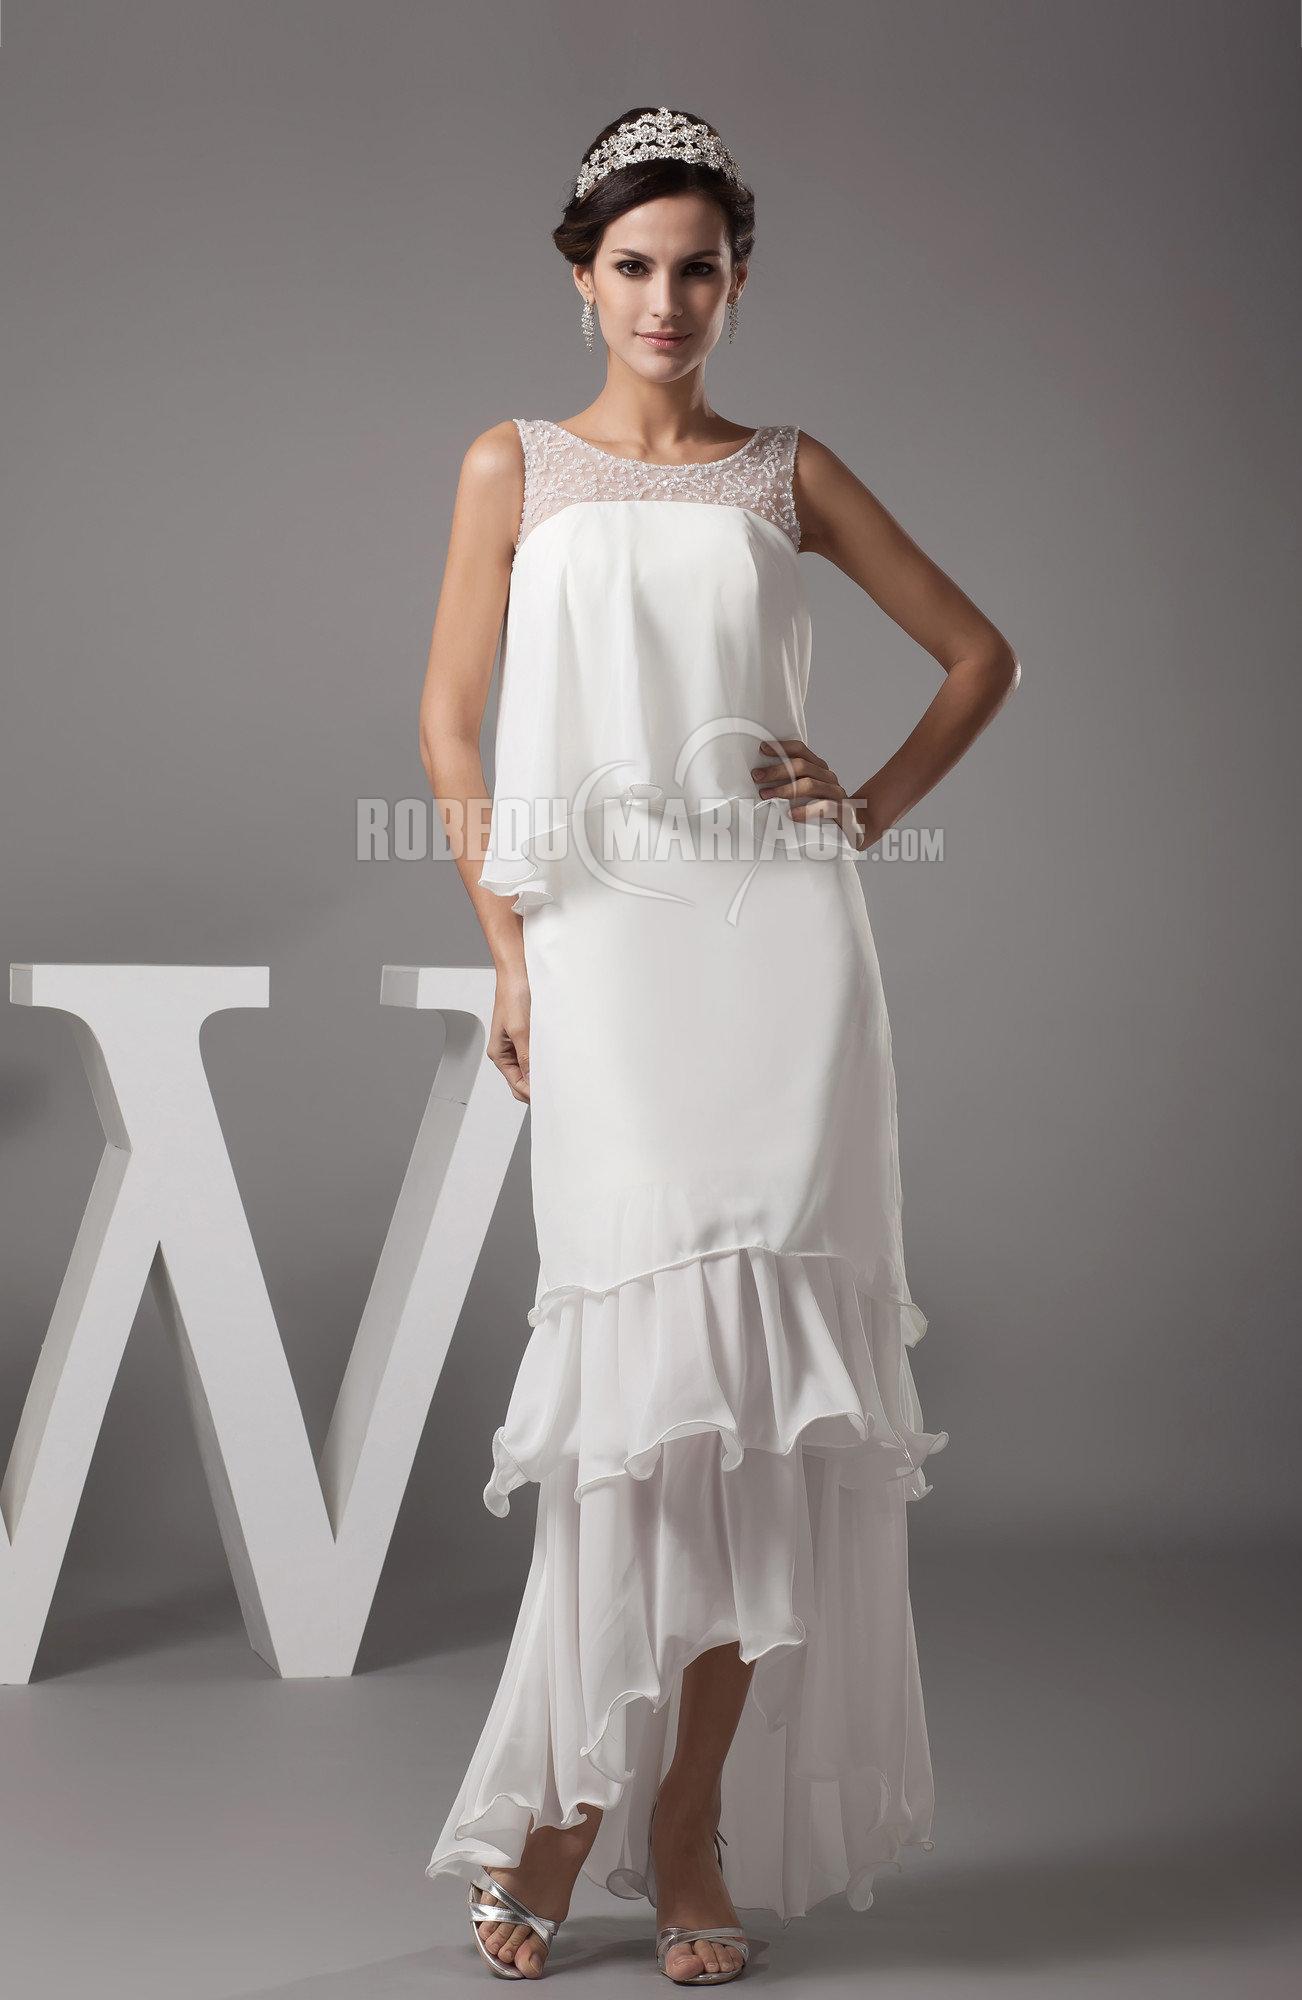 > Robe de mariage > Robe de mariée civile > Traîne watteau robe de ...